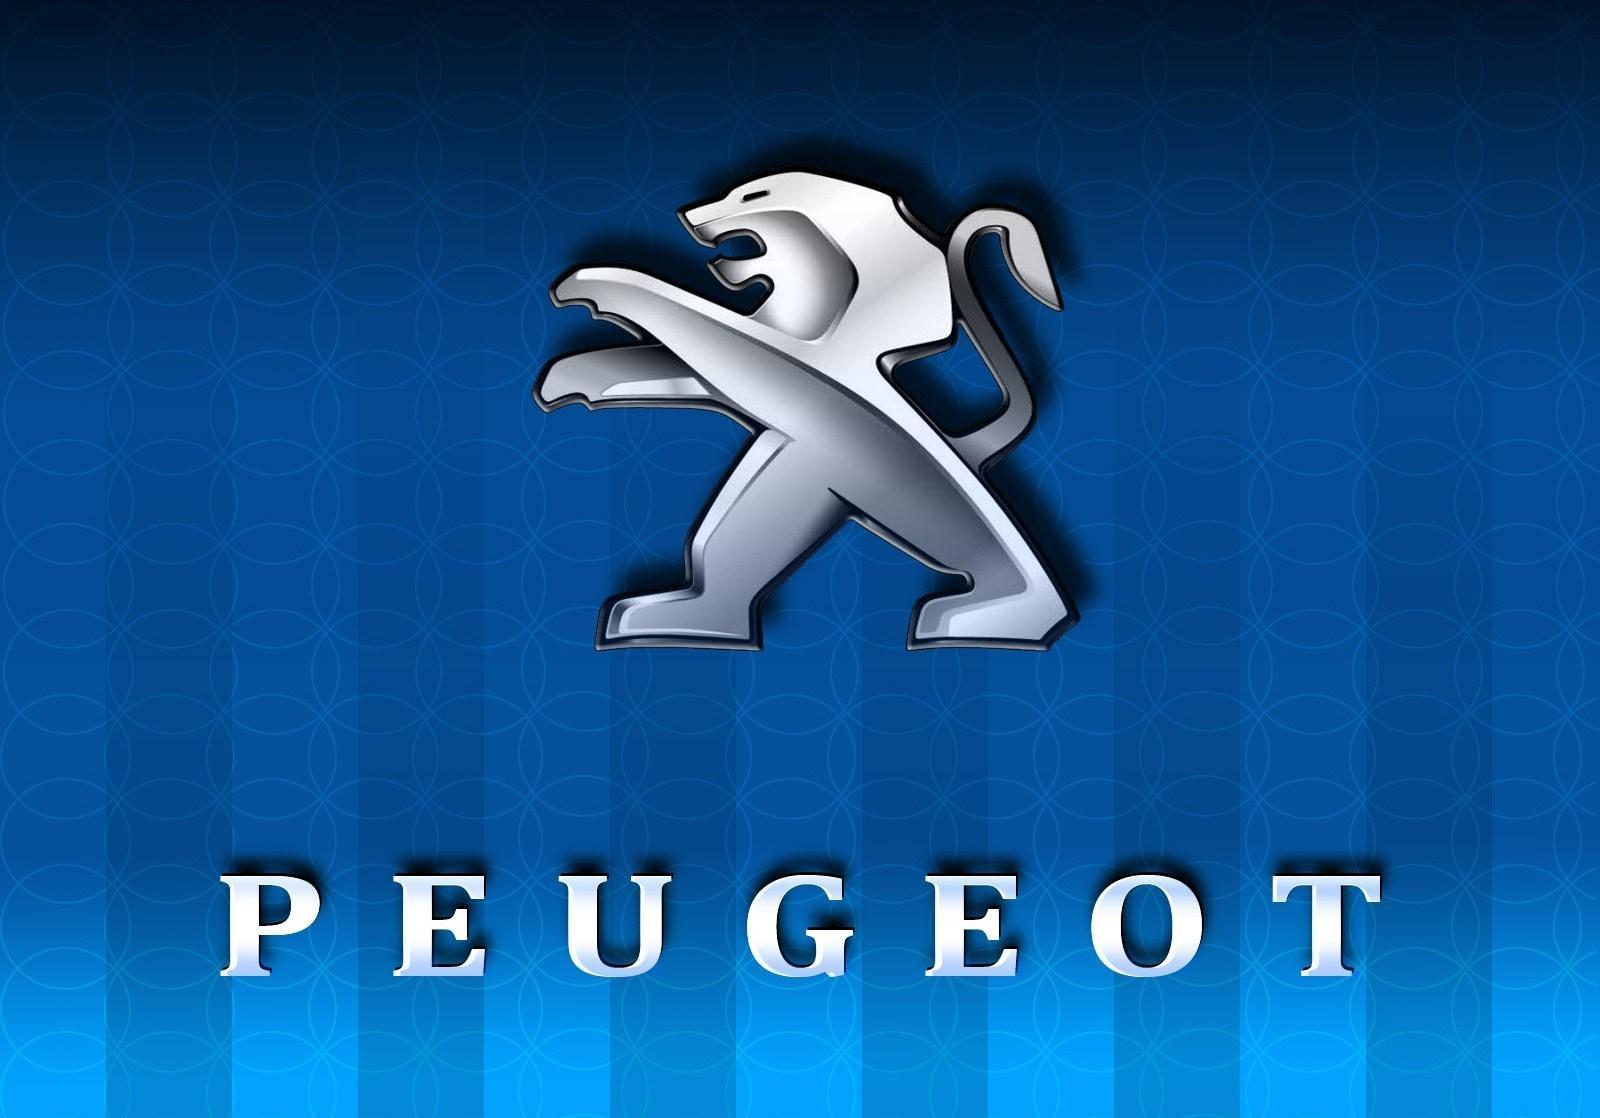 Peugeot Logo Wallpapers Wallpaper Cave